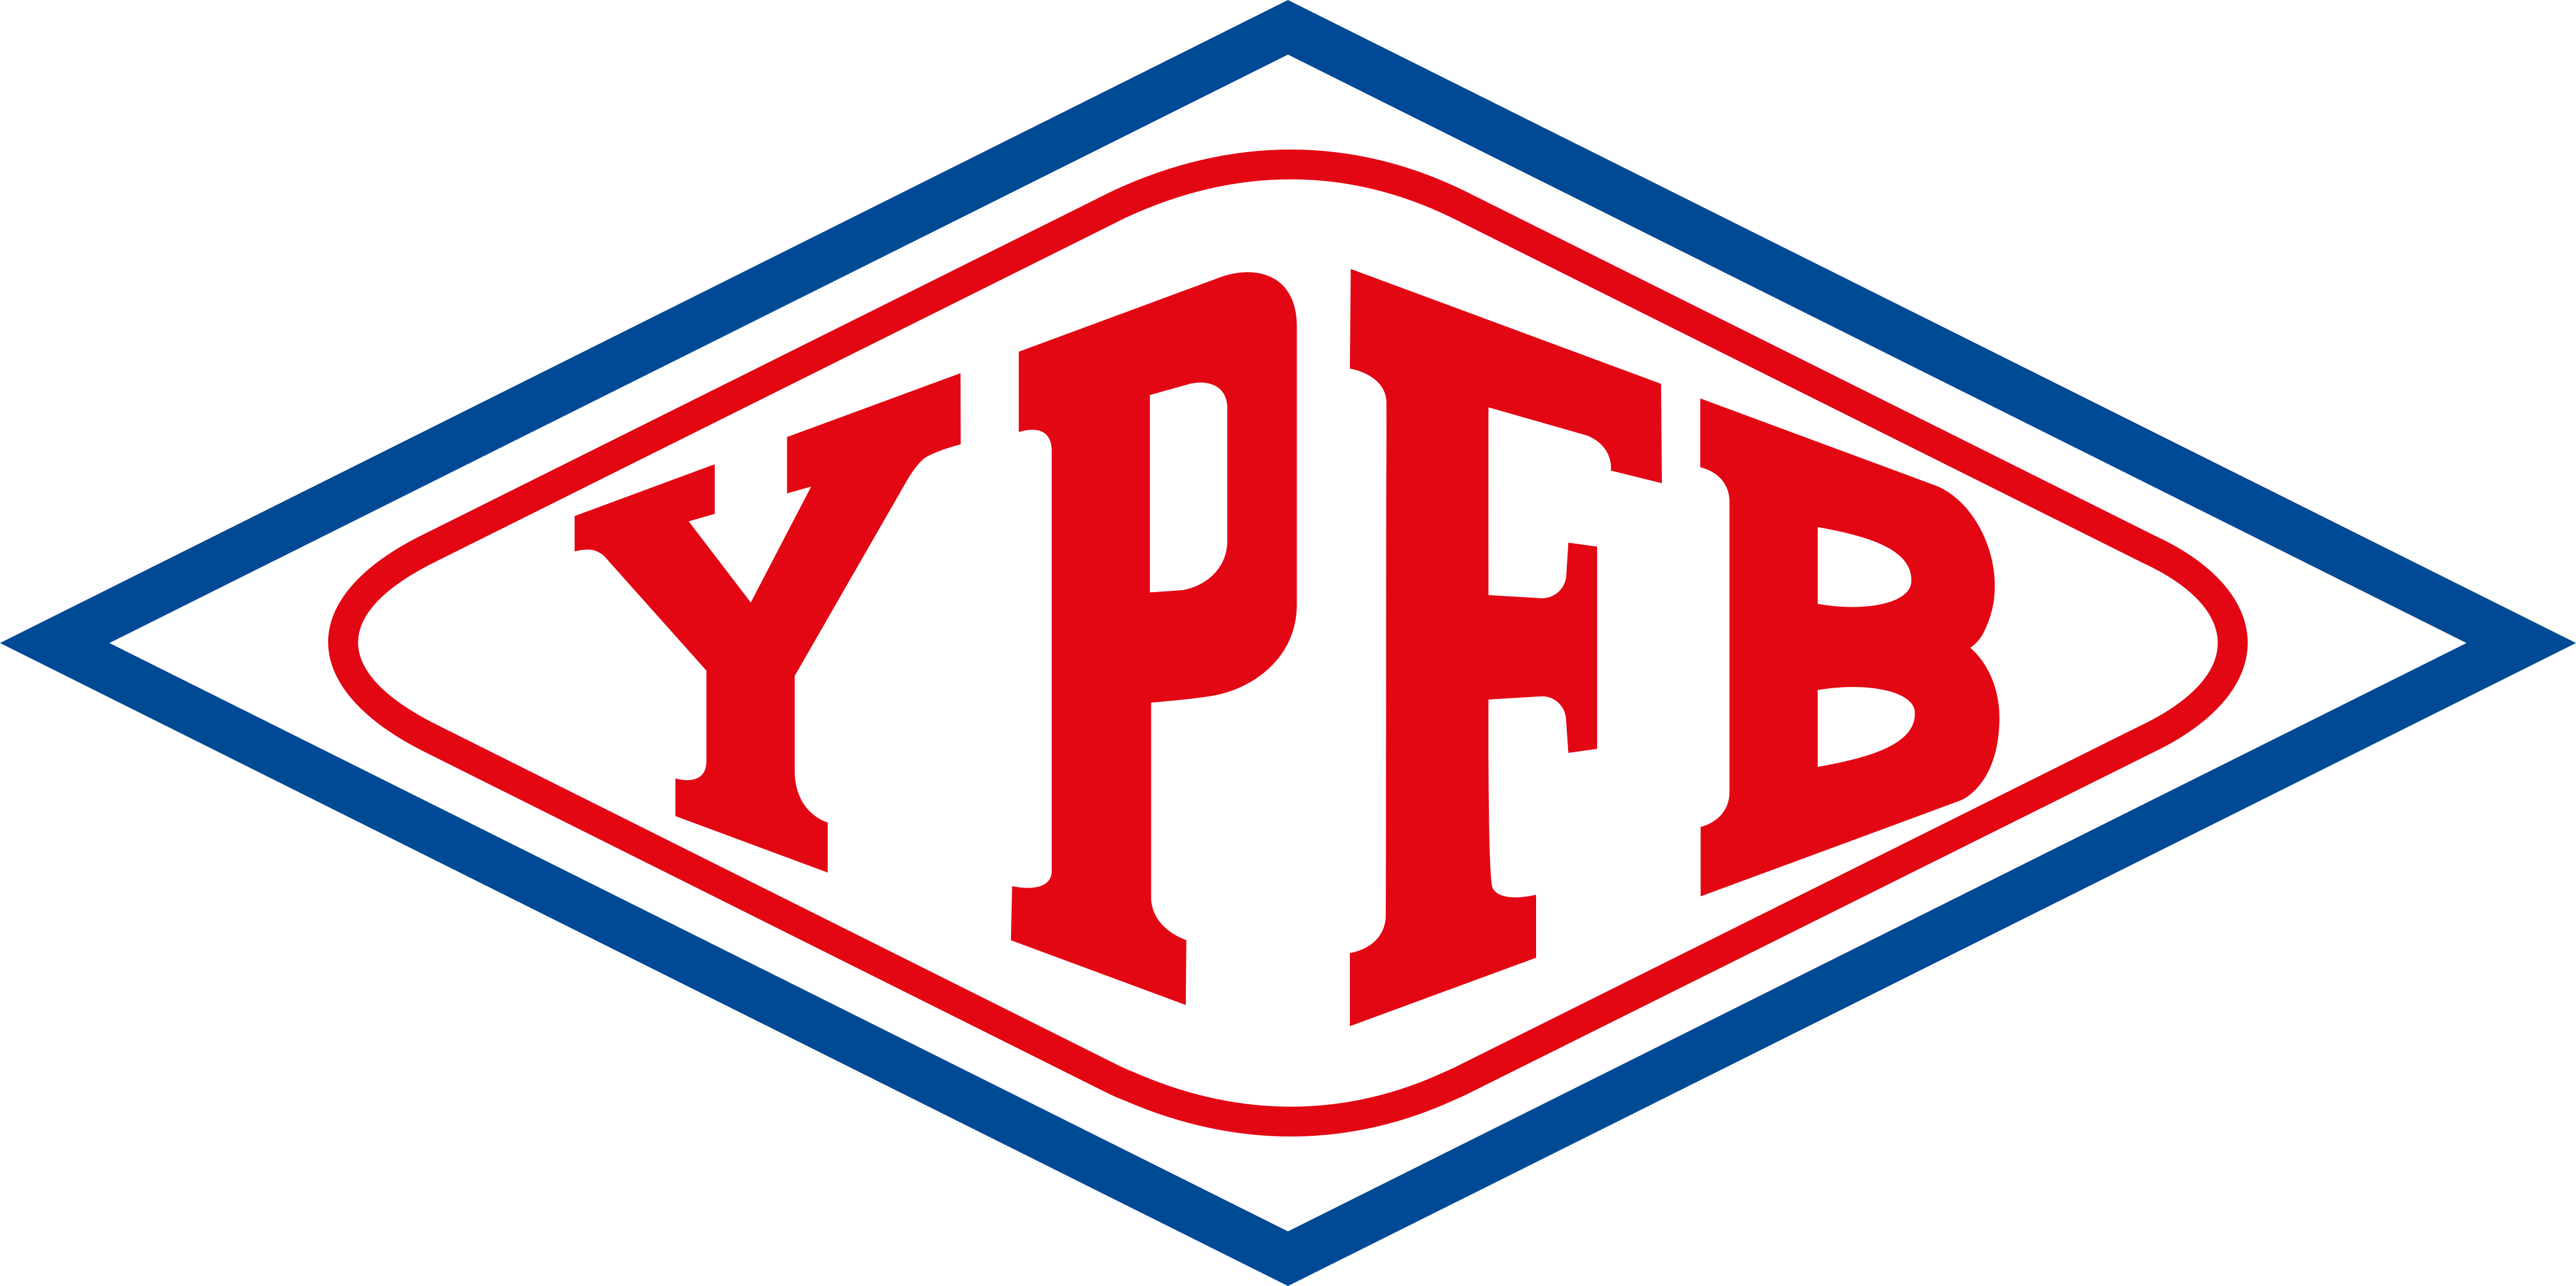 ypfb logo - YPFB Logo